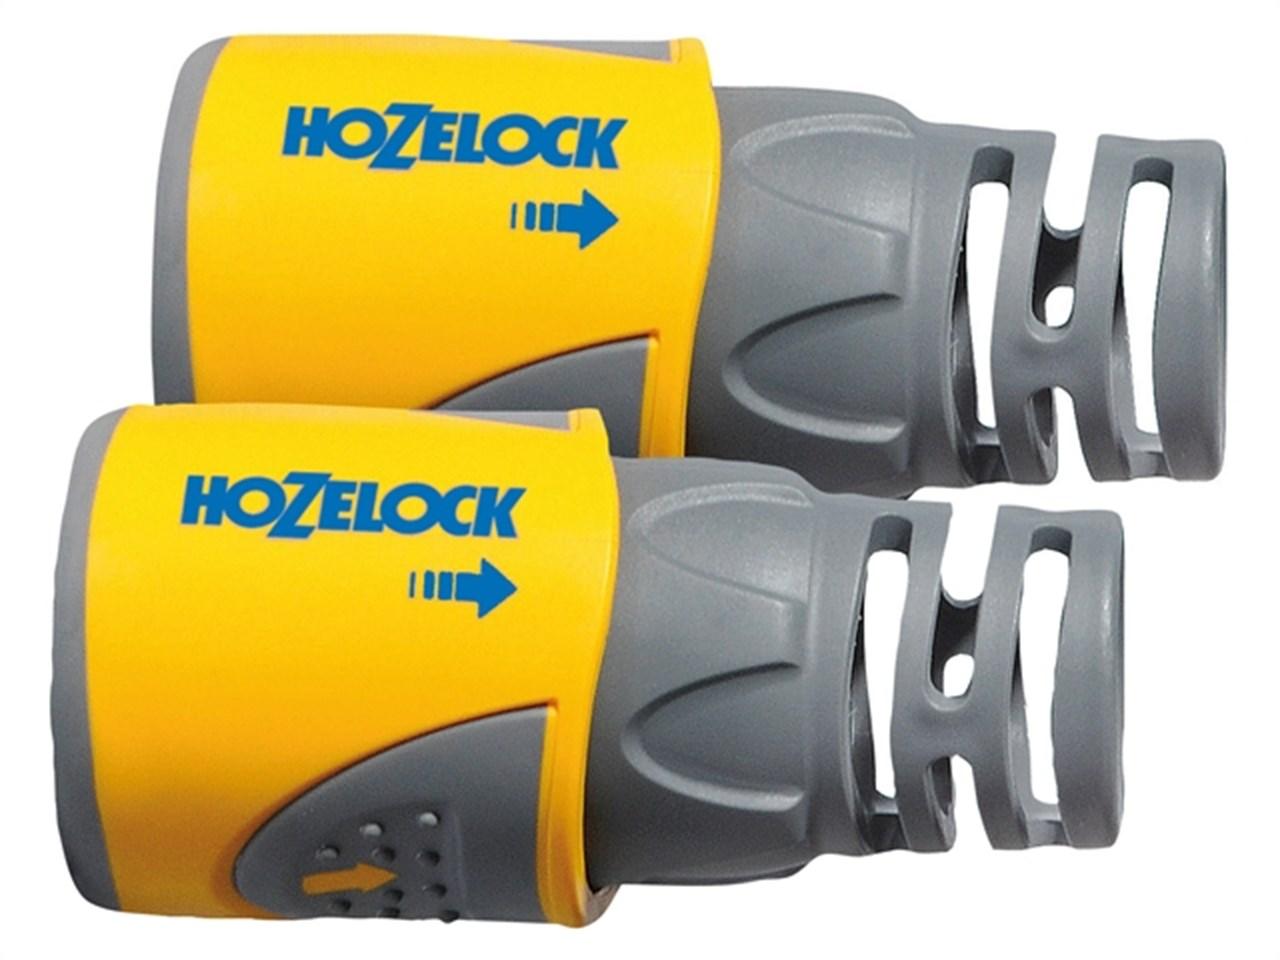 hozelock slangstuk (2sts)